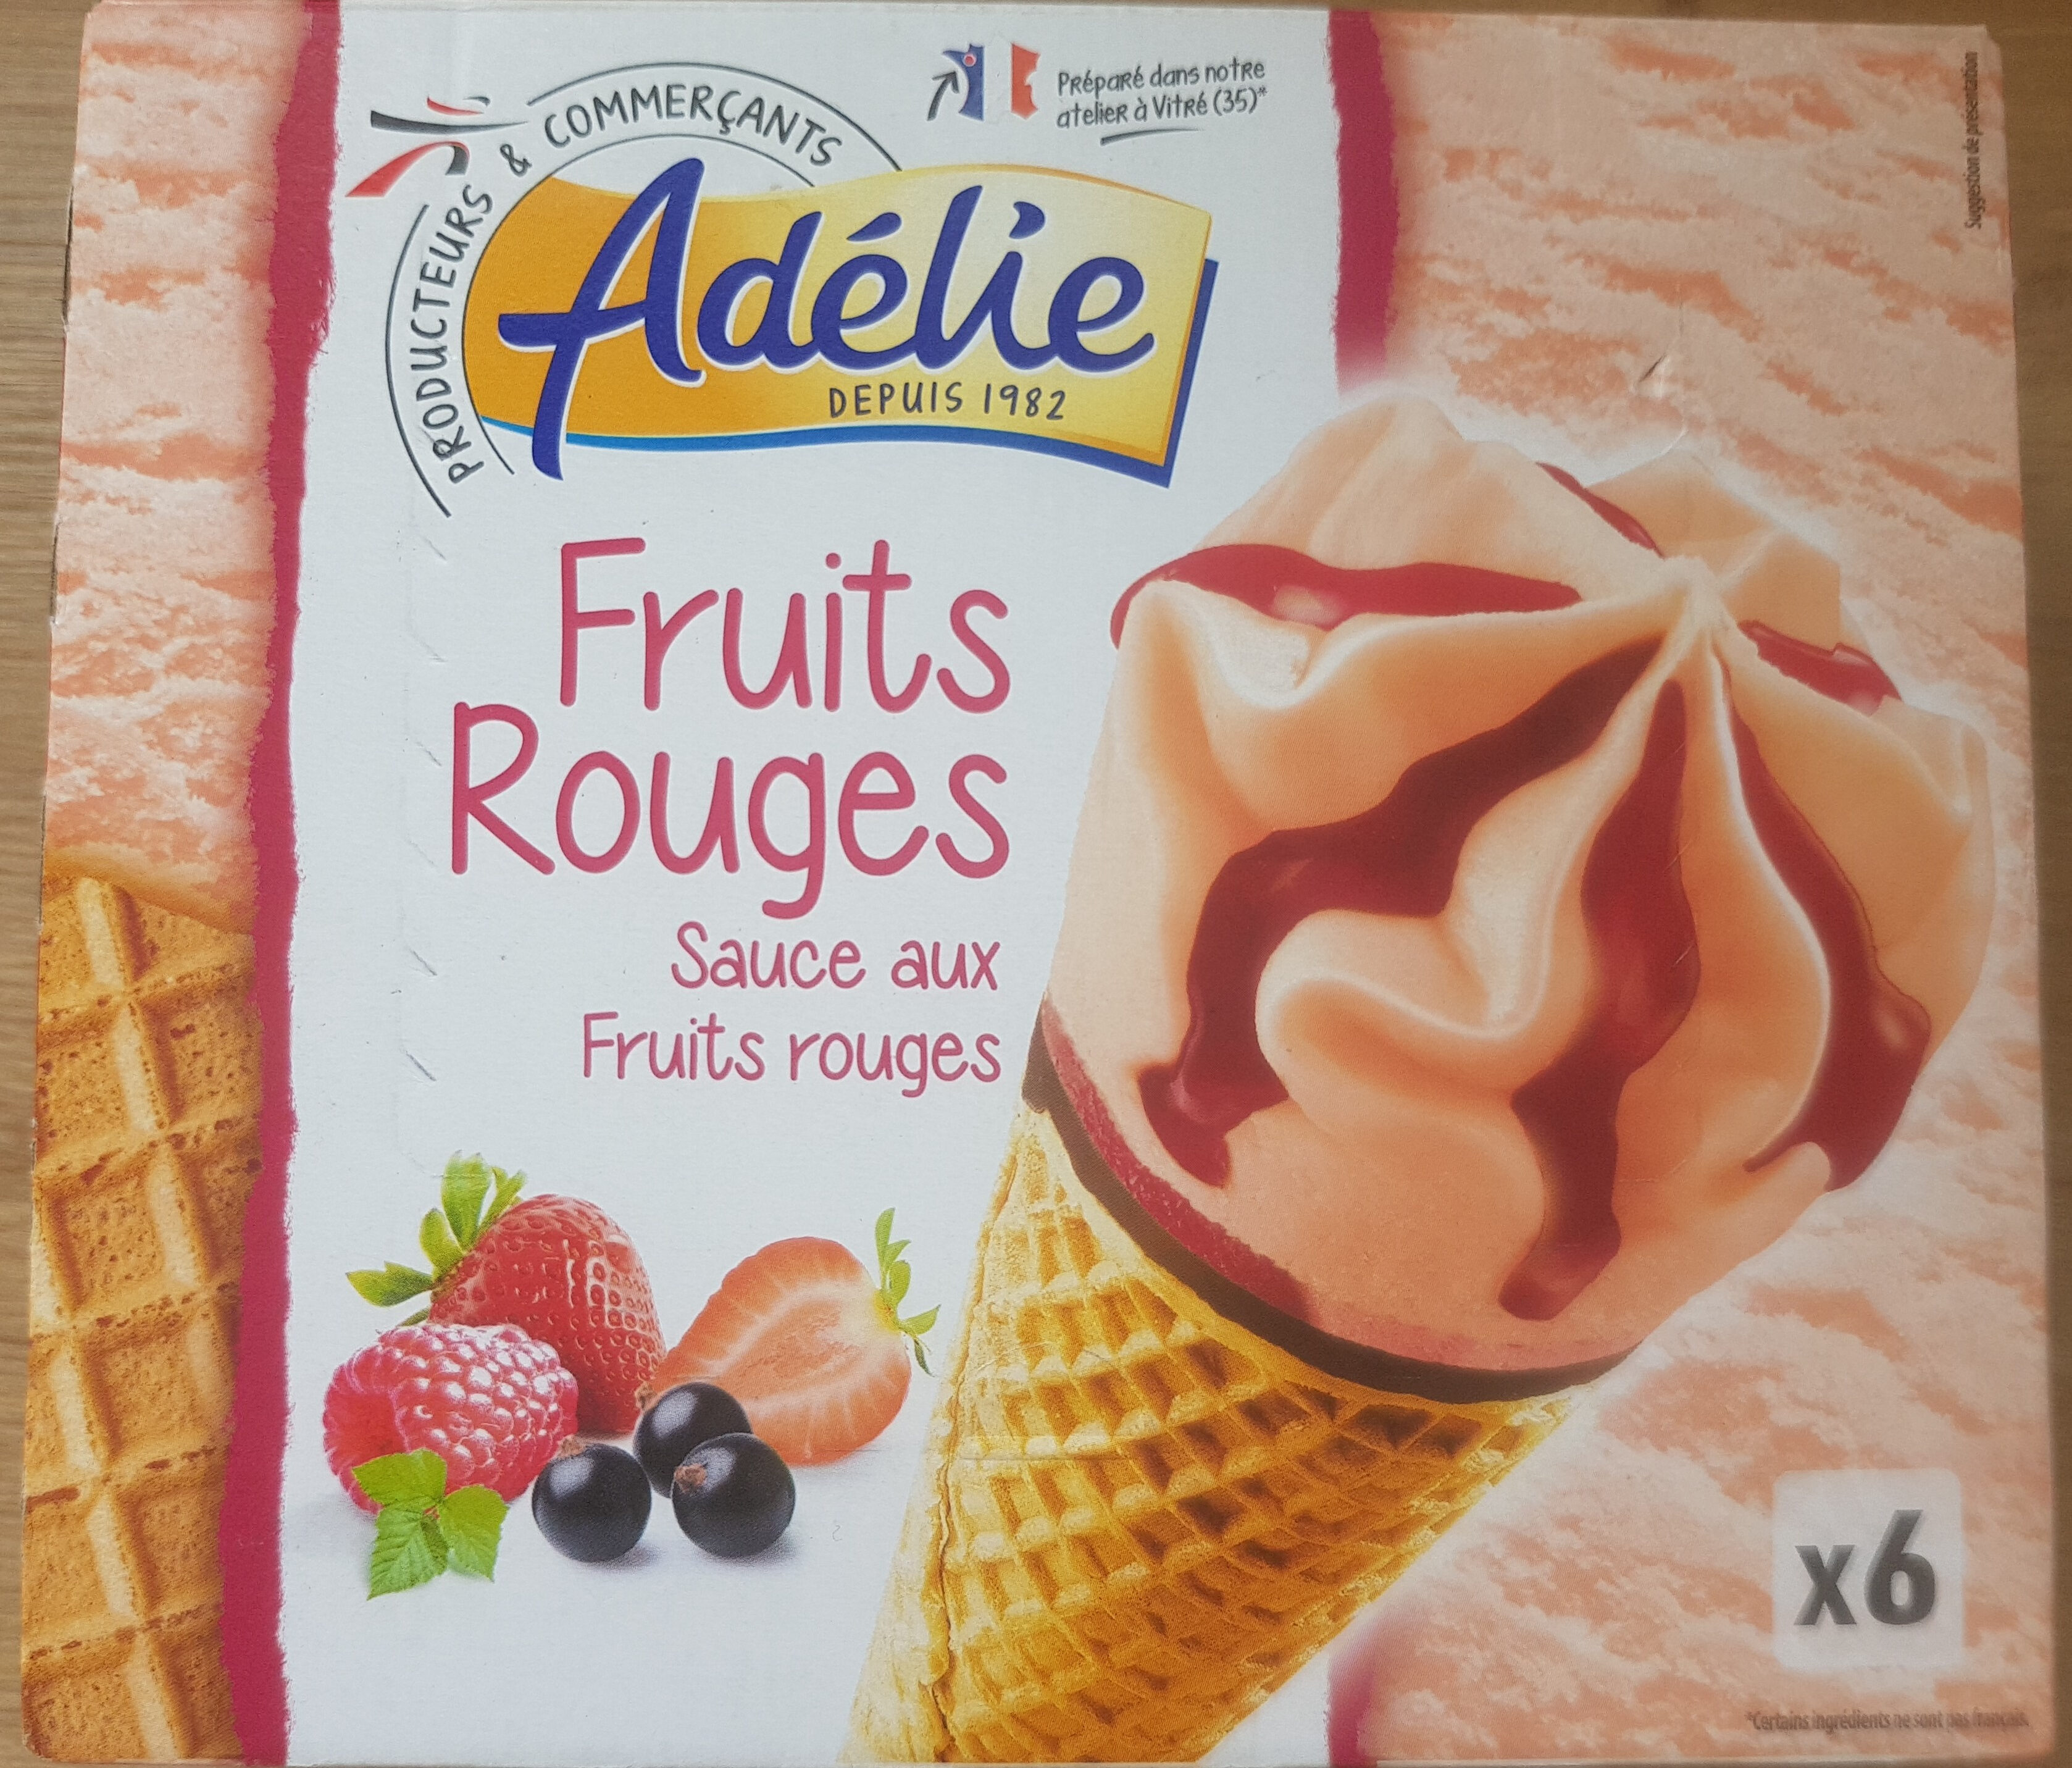 Cône, Sorbets Fruits Rouges, Cassis Fraise Framboise - Produit